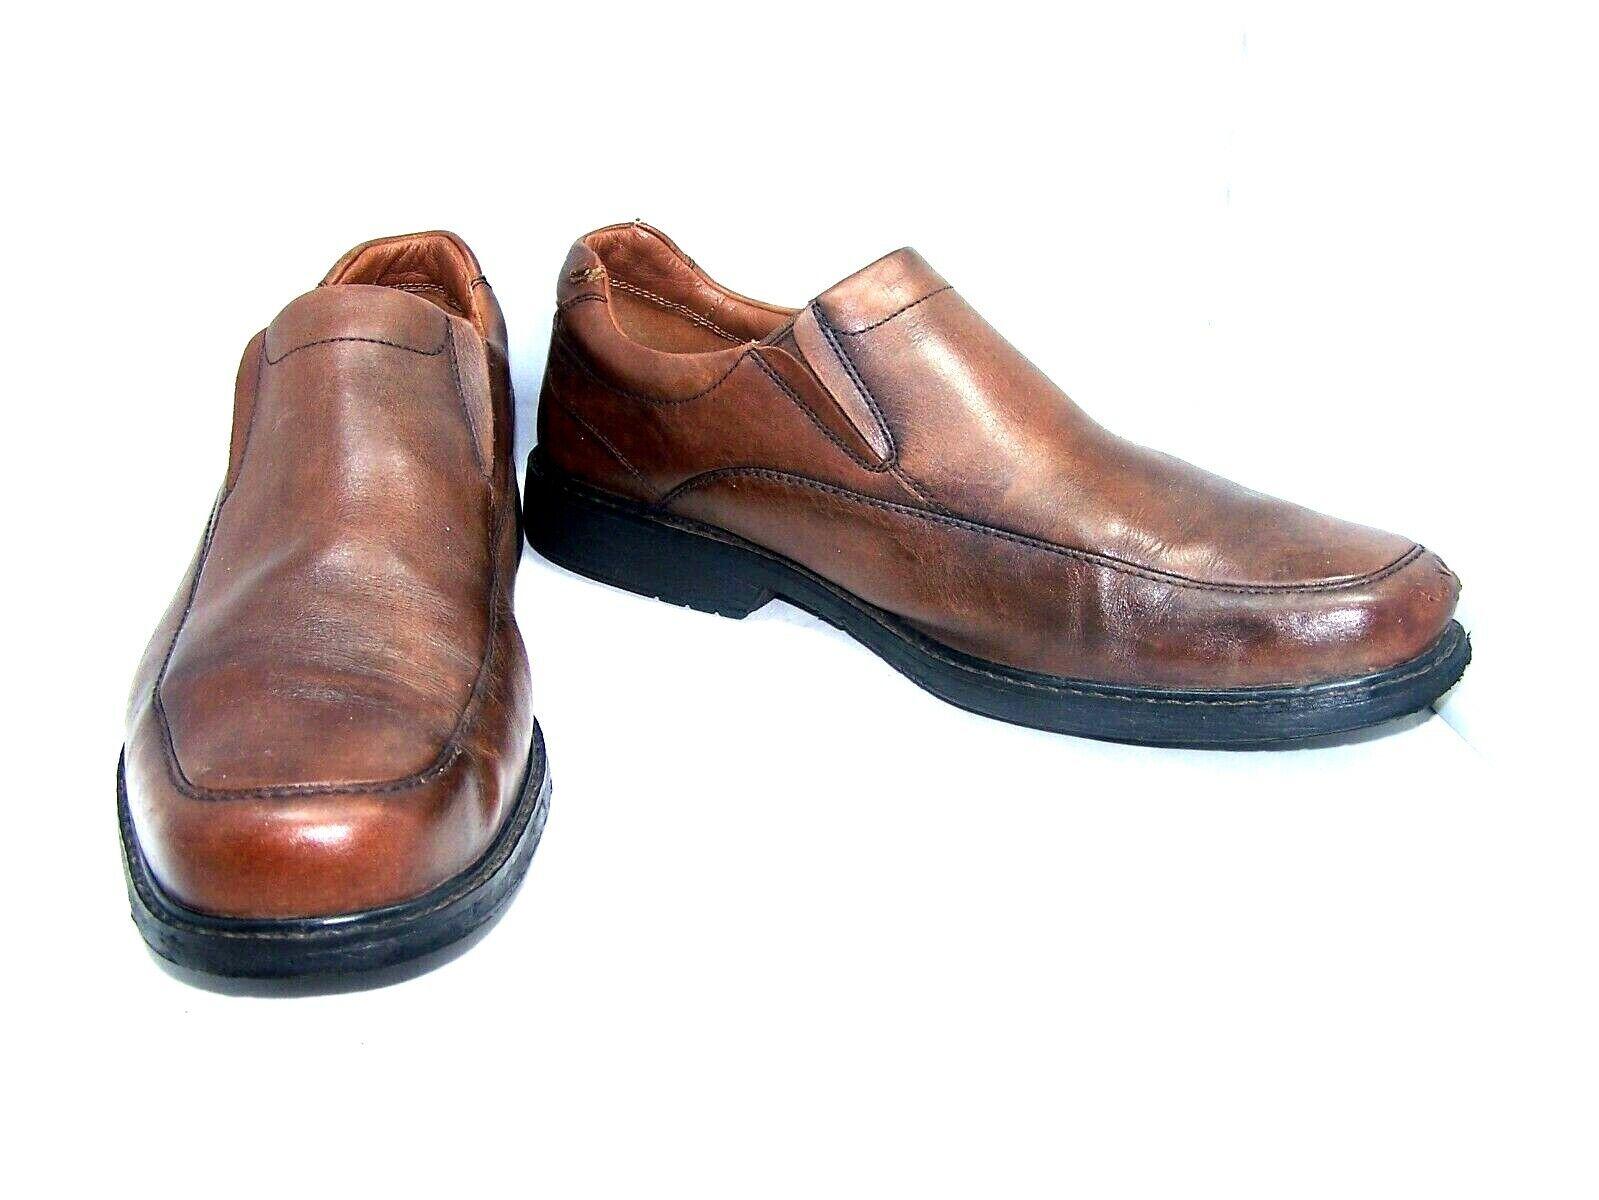 EUC Clarks Unstructured SZ 10.5 med chestnut brown leather loafer 13285